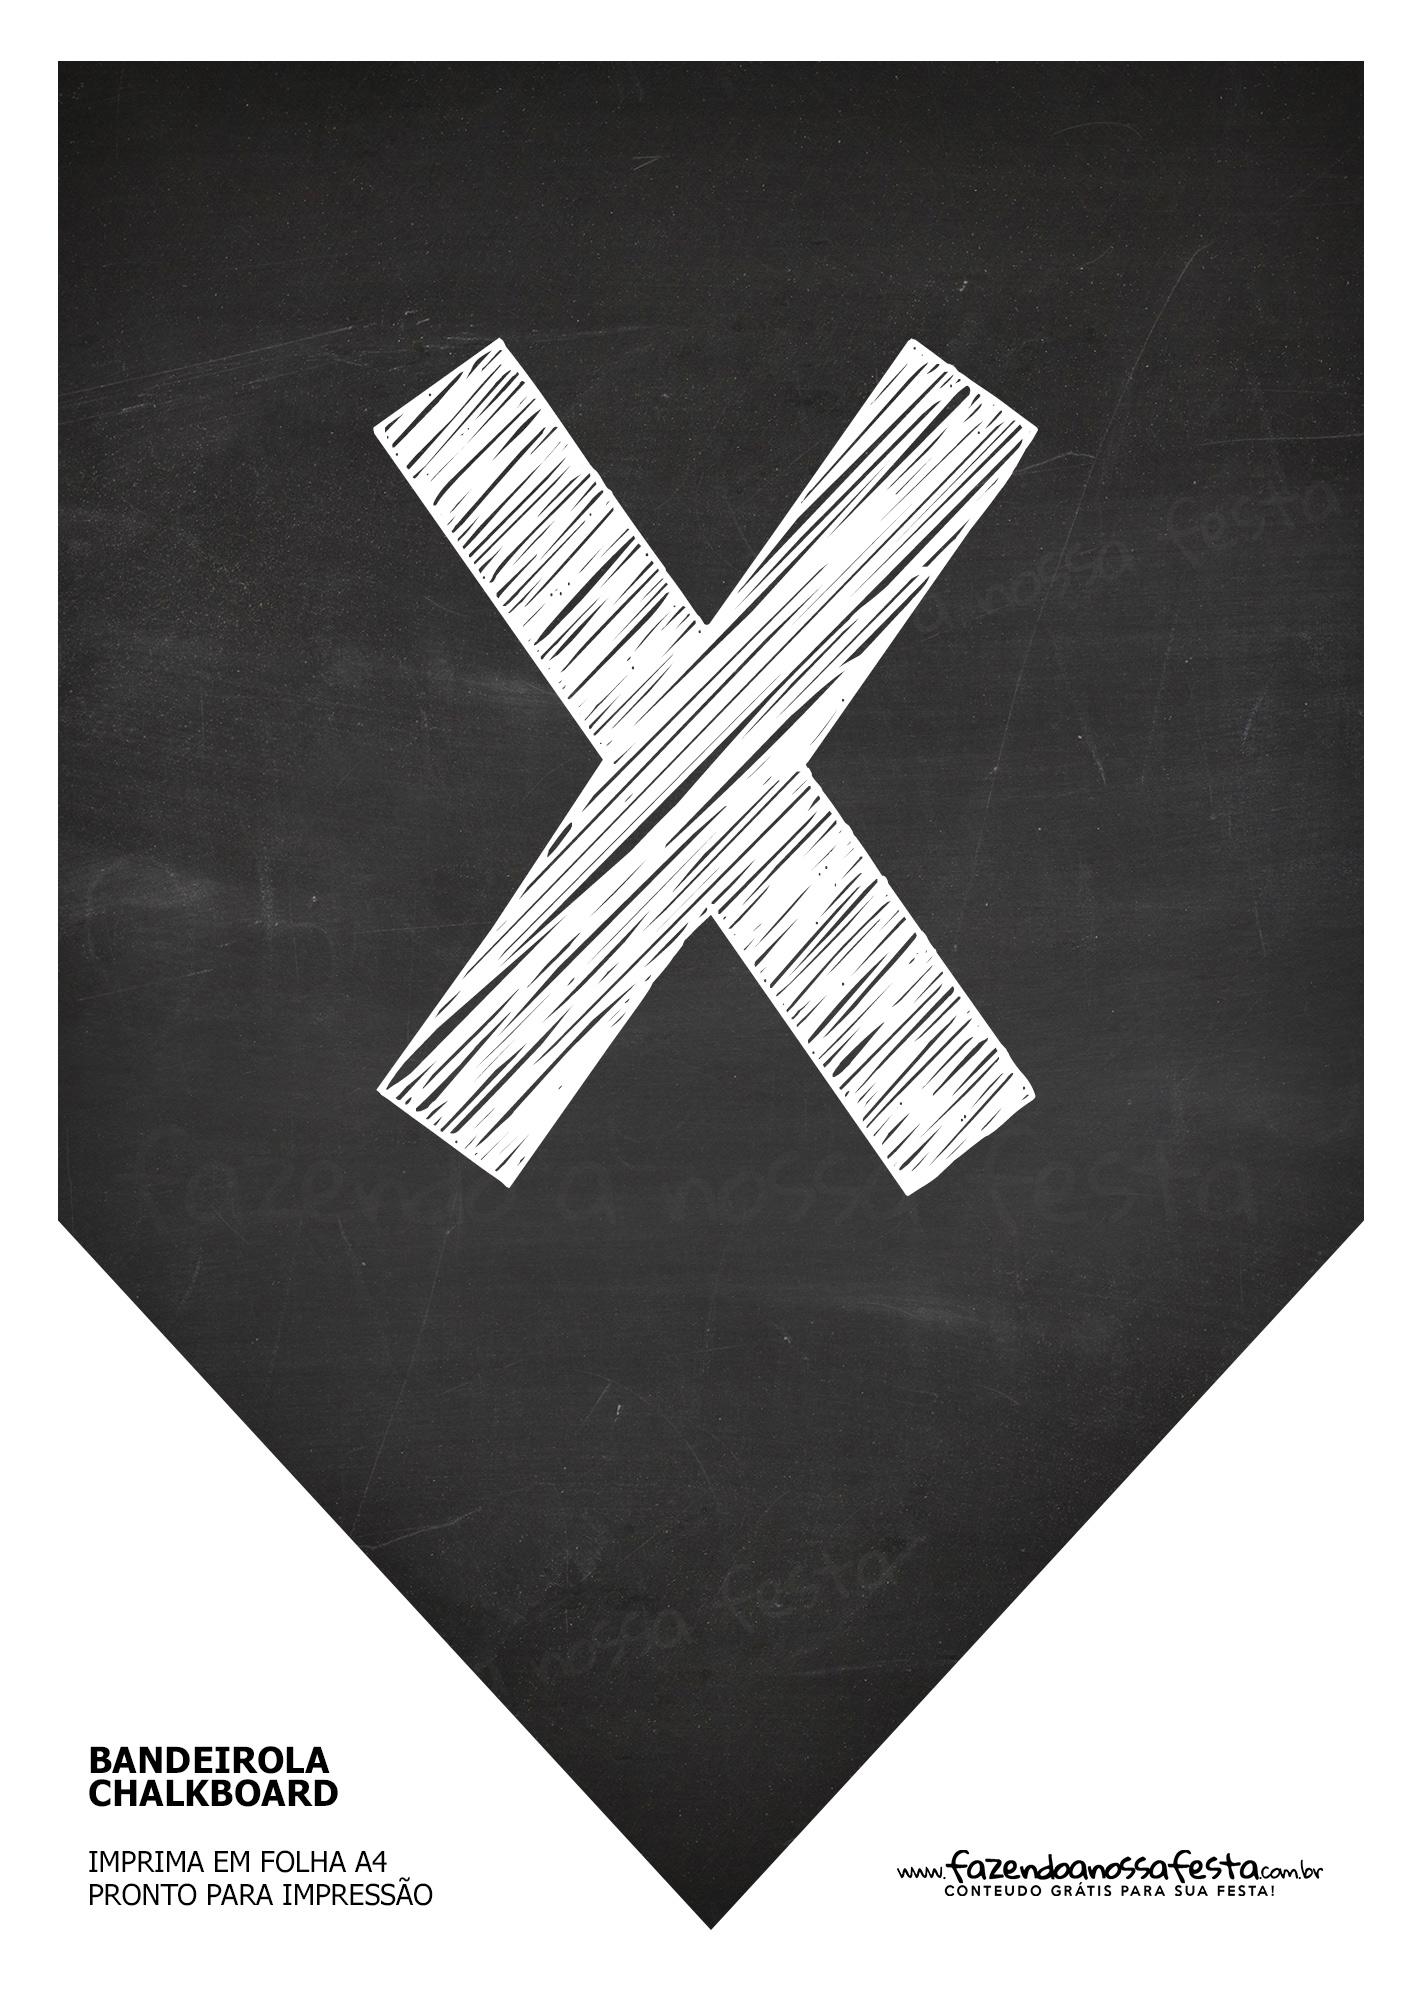 Bandeirinha Chalkboard X